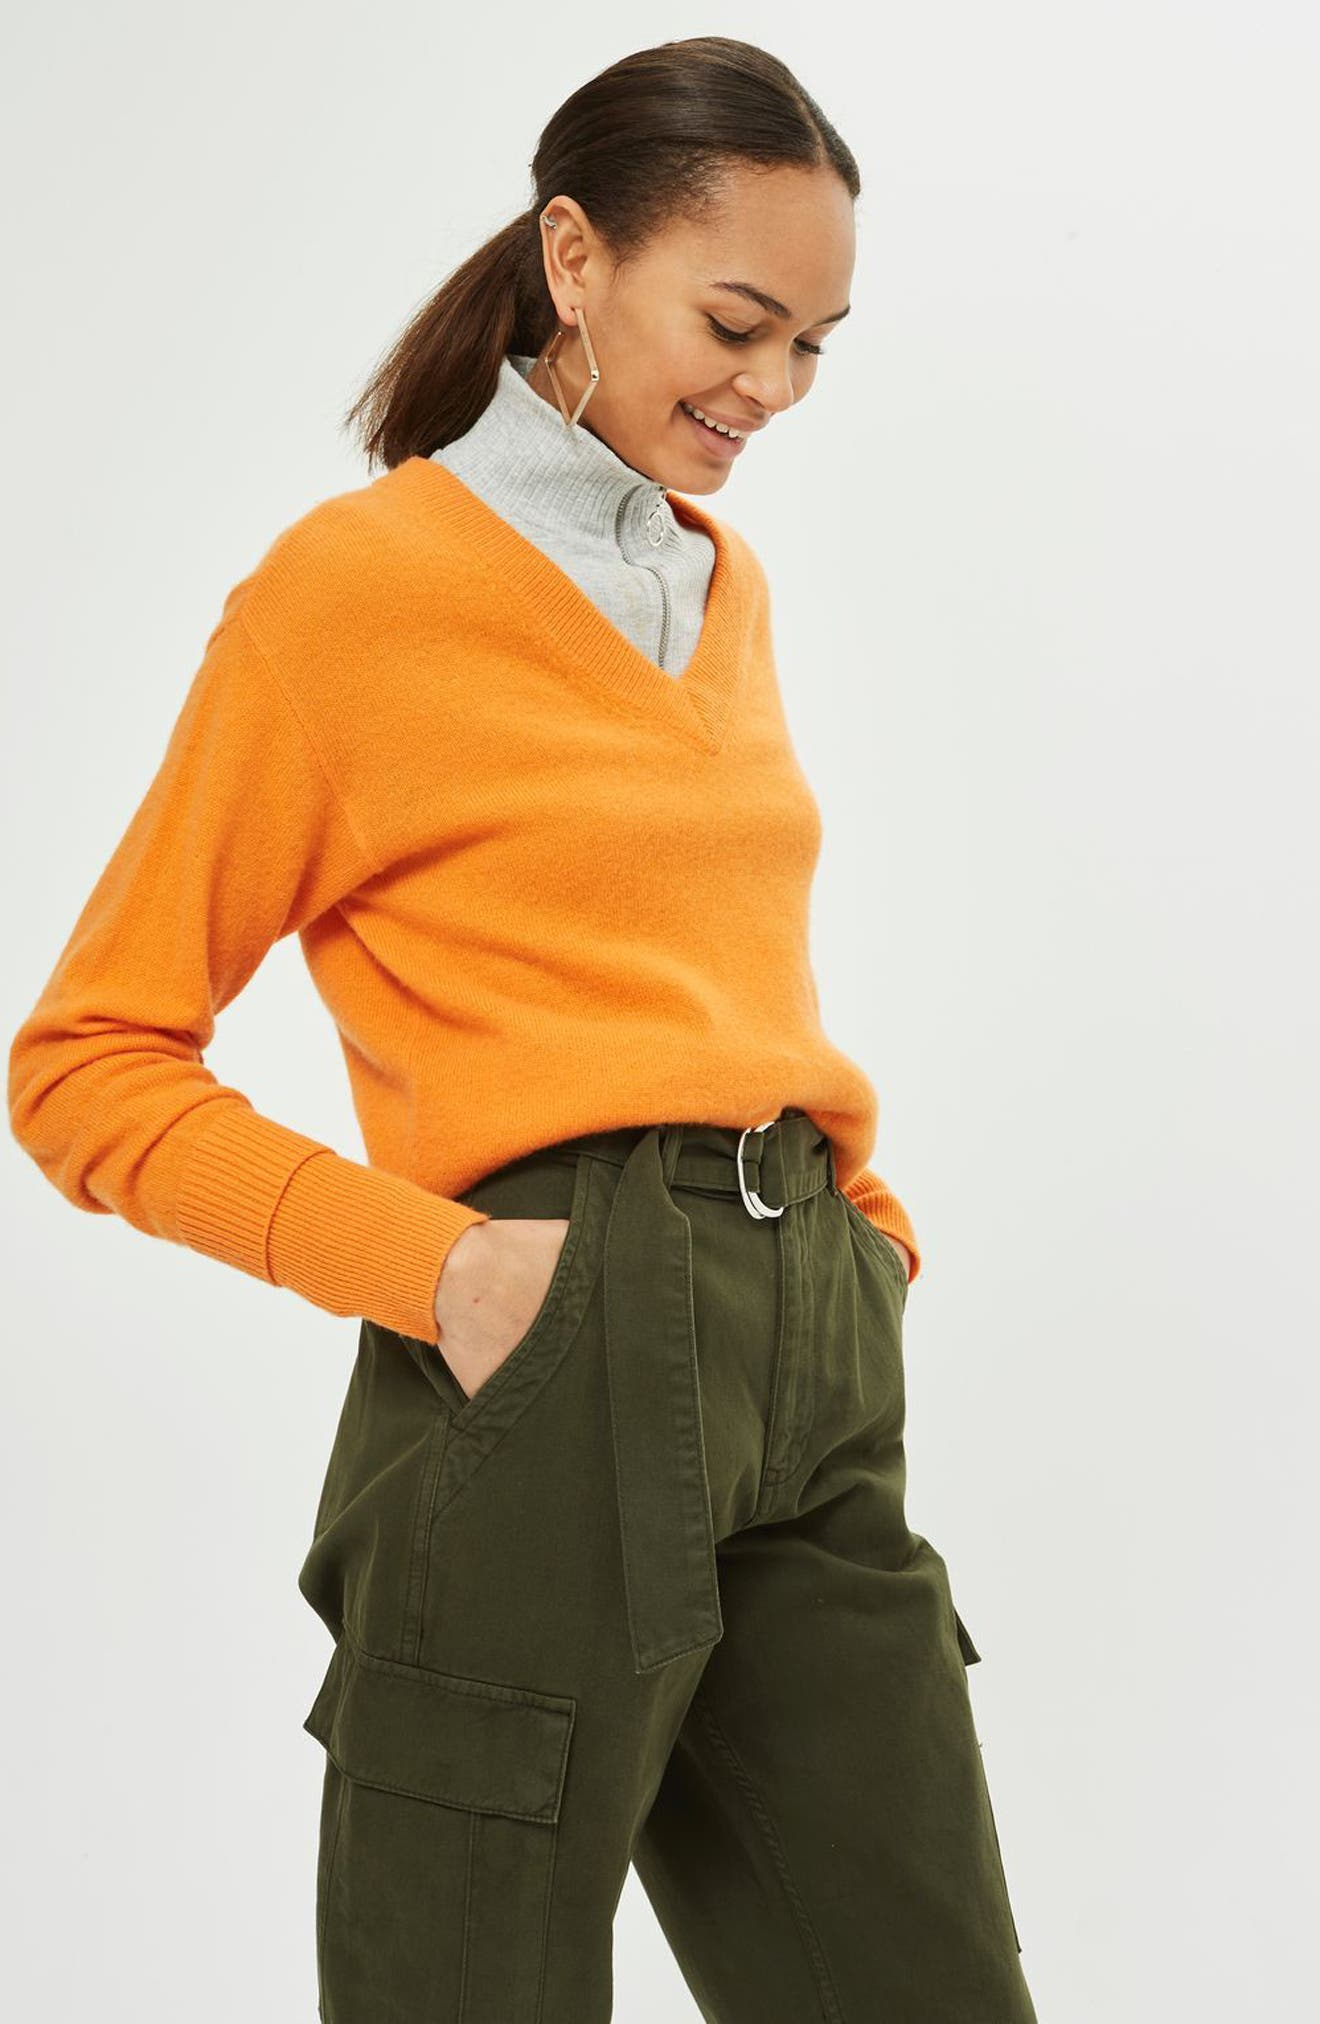 Combat Pocket Utility Trousers,                             Alternate thumbnail 4, color,                             310